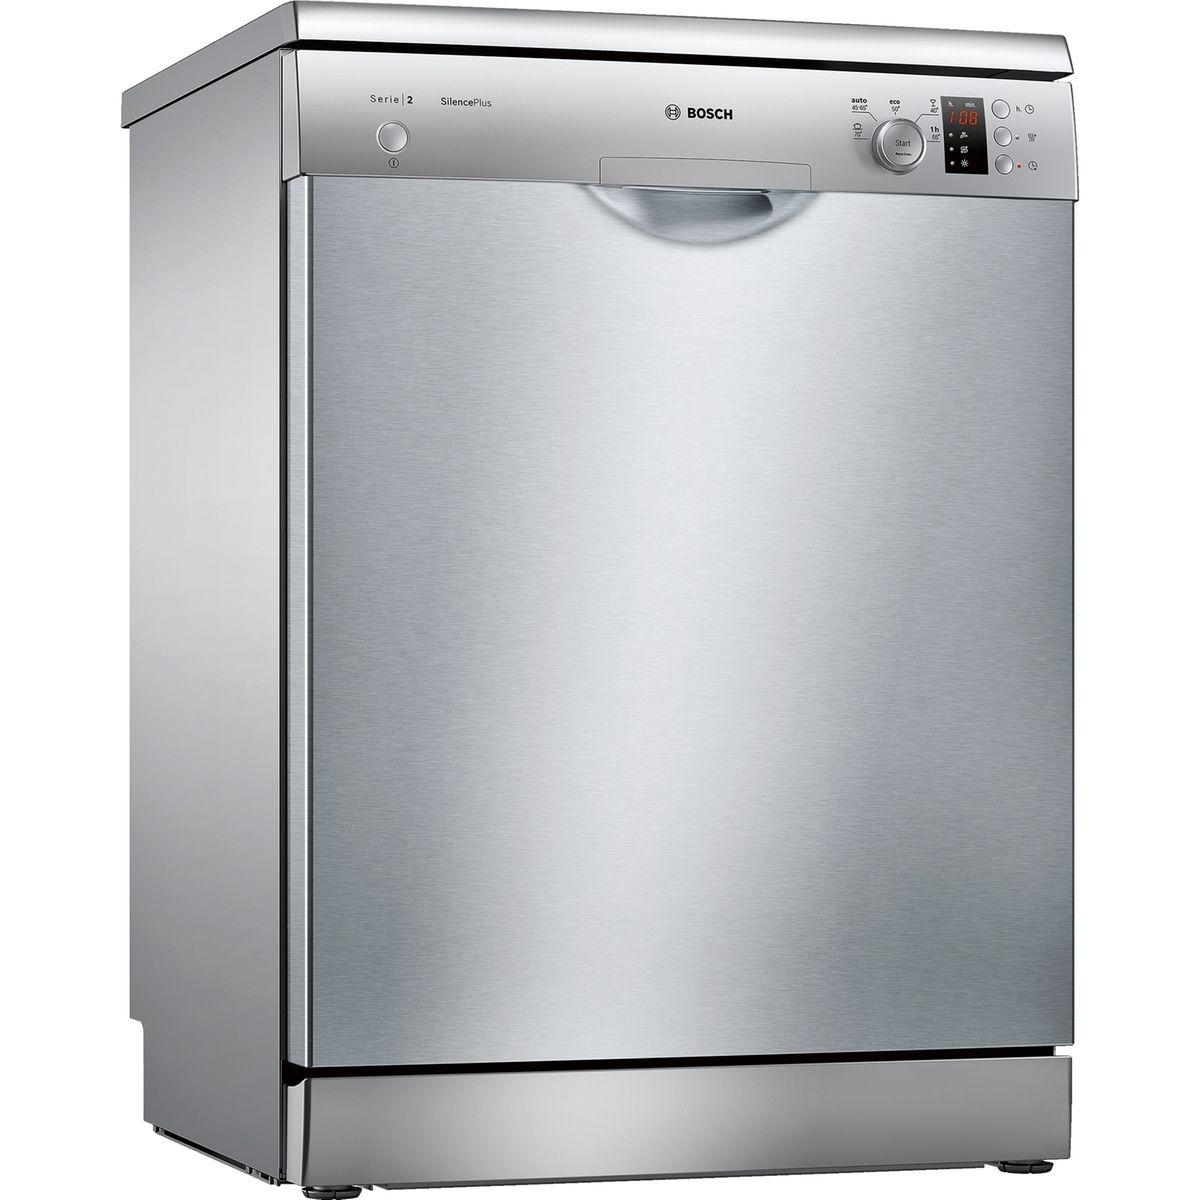 Lave-vaisselle Silence plus SMS25AI04E